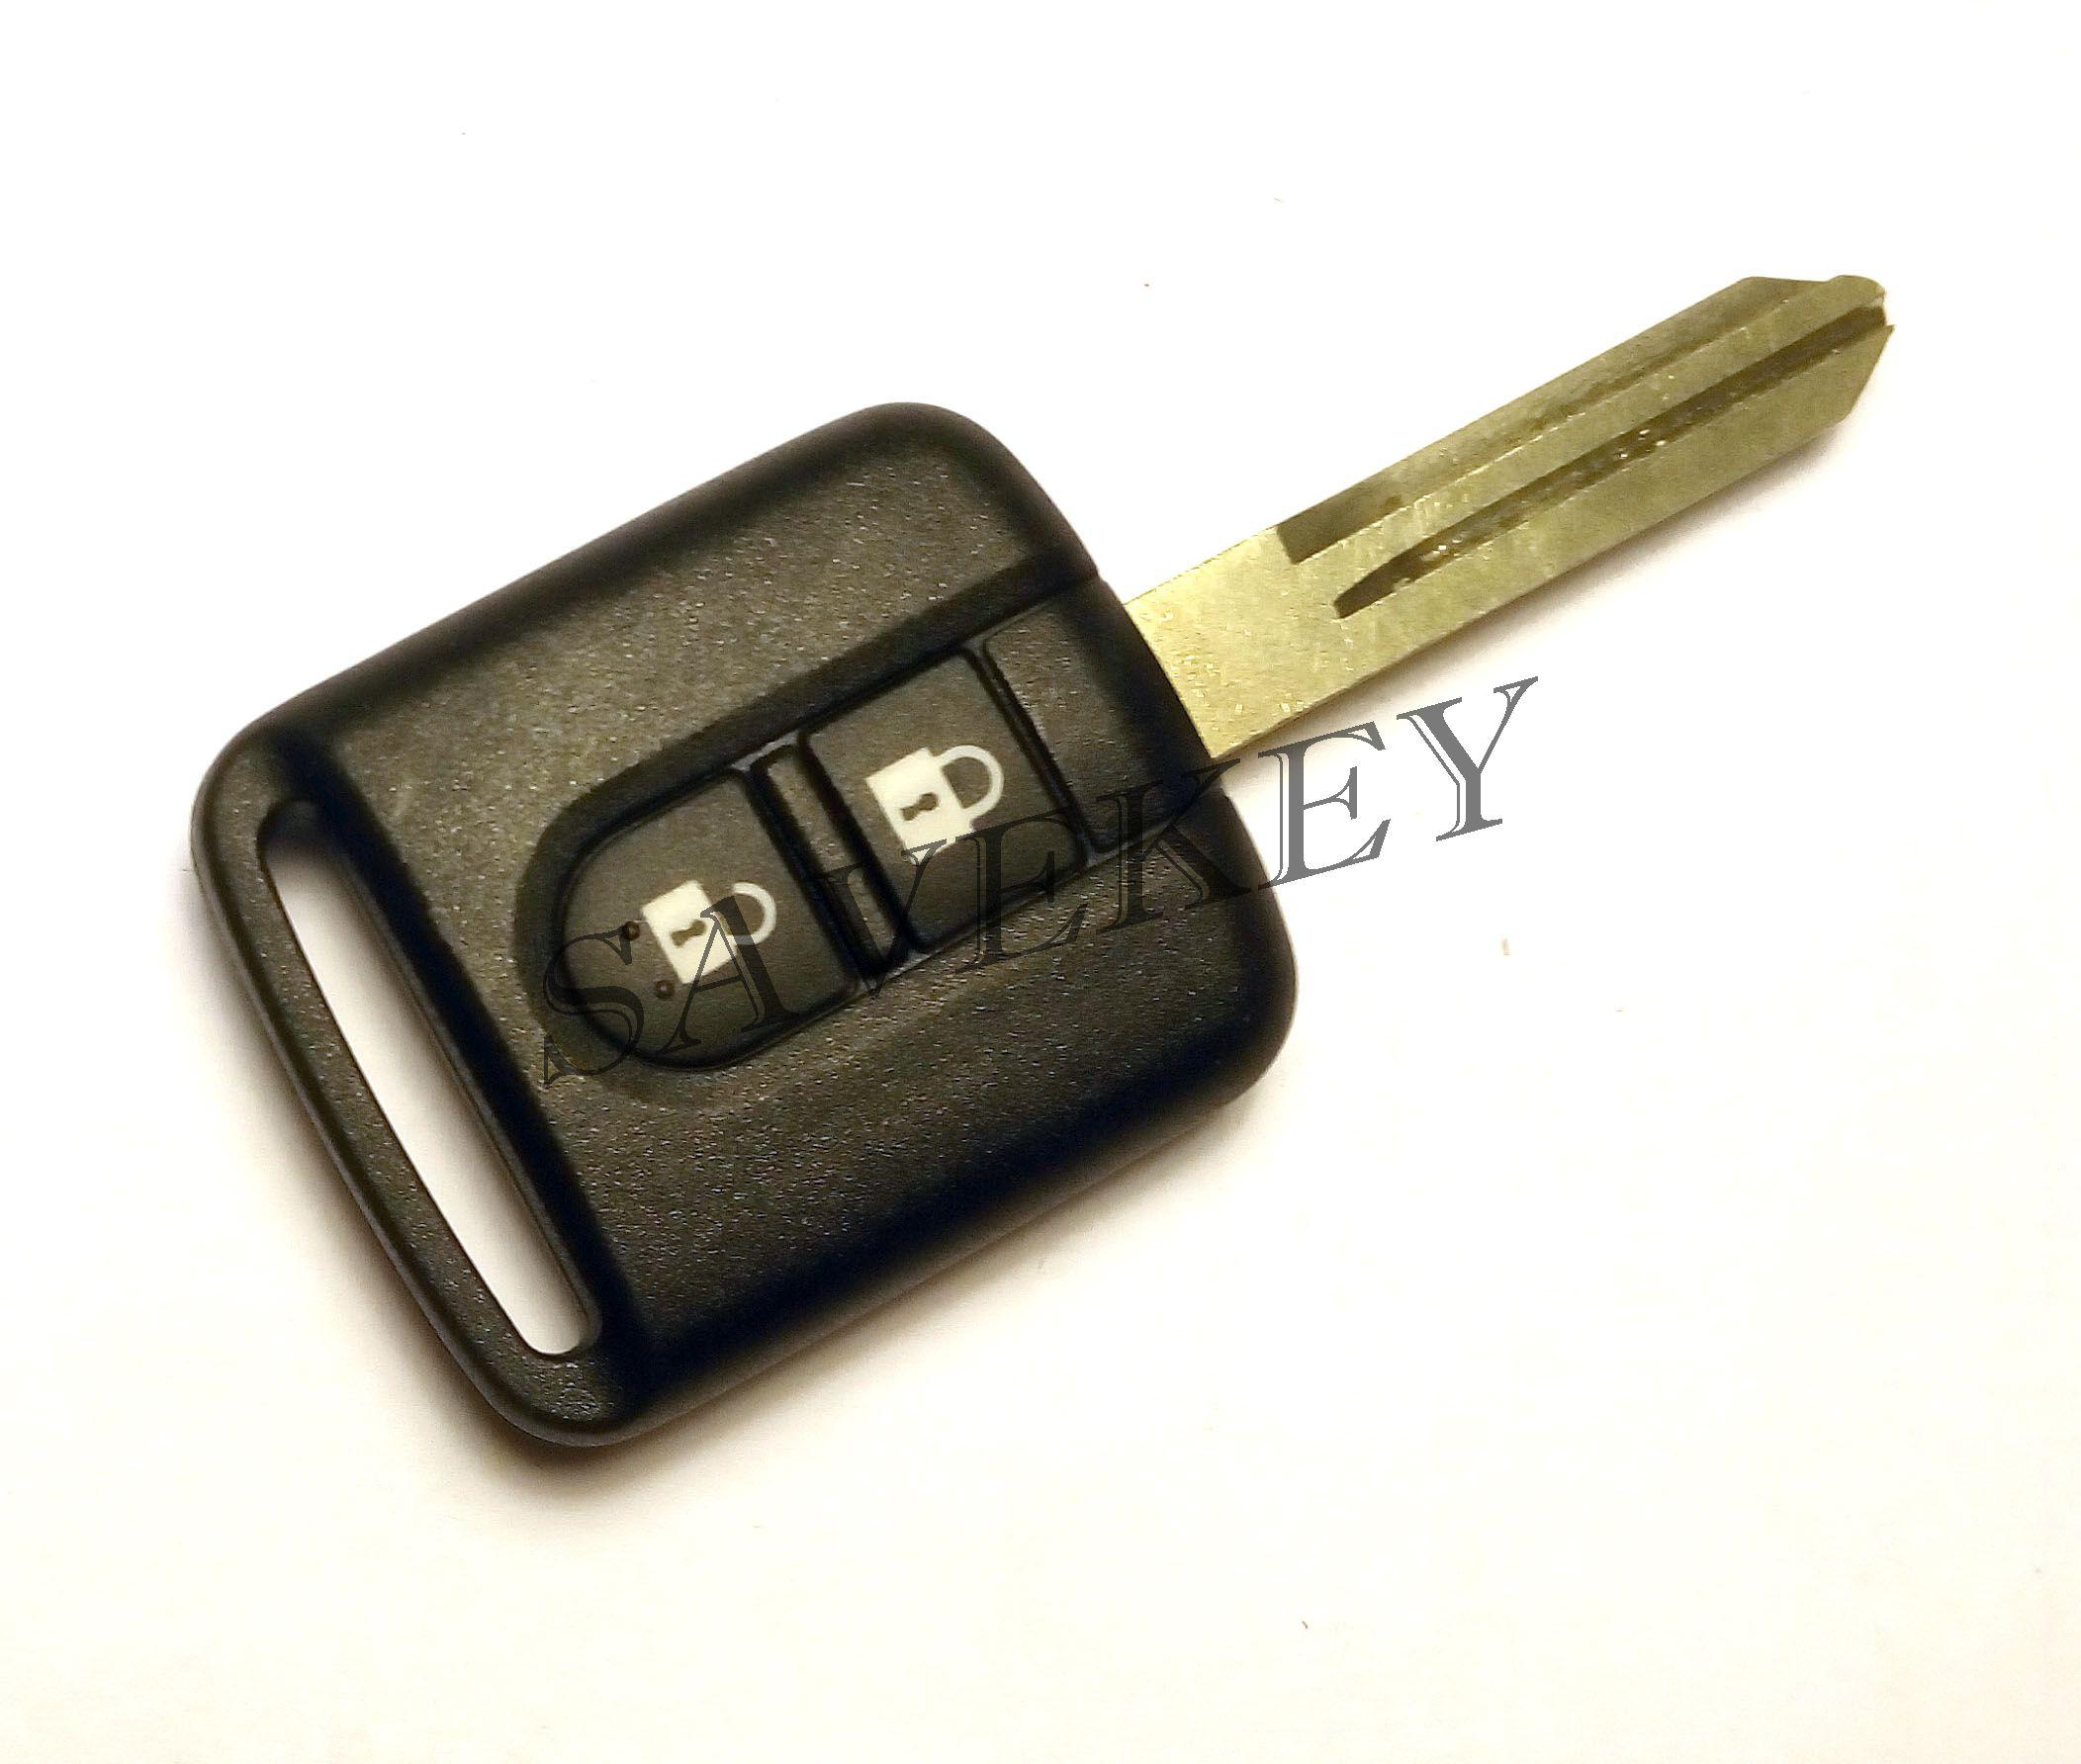 Дистанционный ключ Nissan для моделей ALMERA, PRIMERA, 350Z, NAVARA, NV200, X-TRAIL, MICRA, NOTE, PATHFINDER, QASHQAI, TIIDA